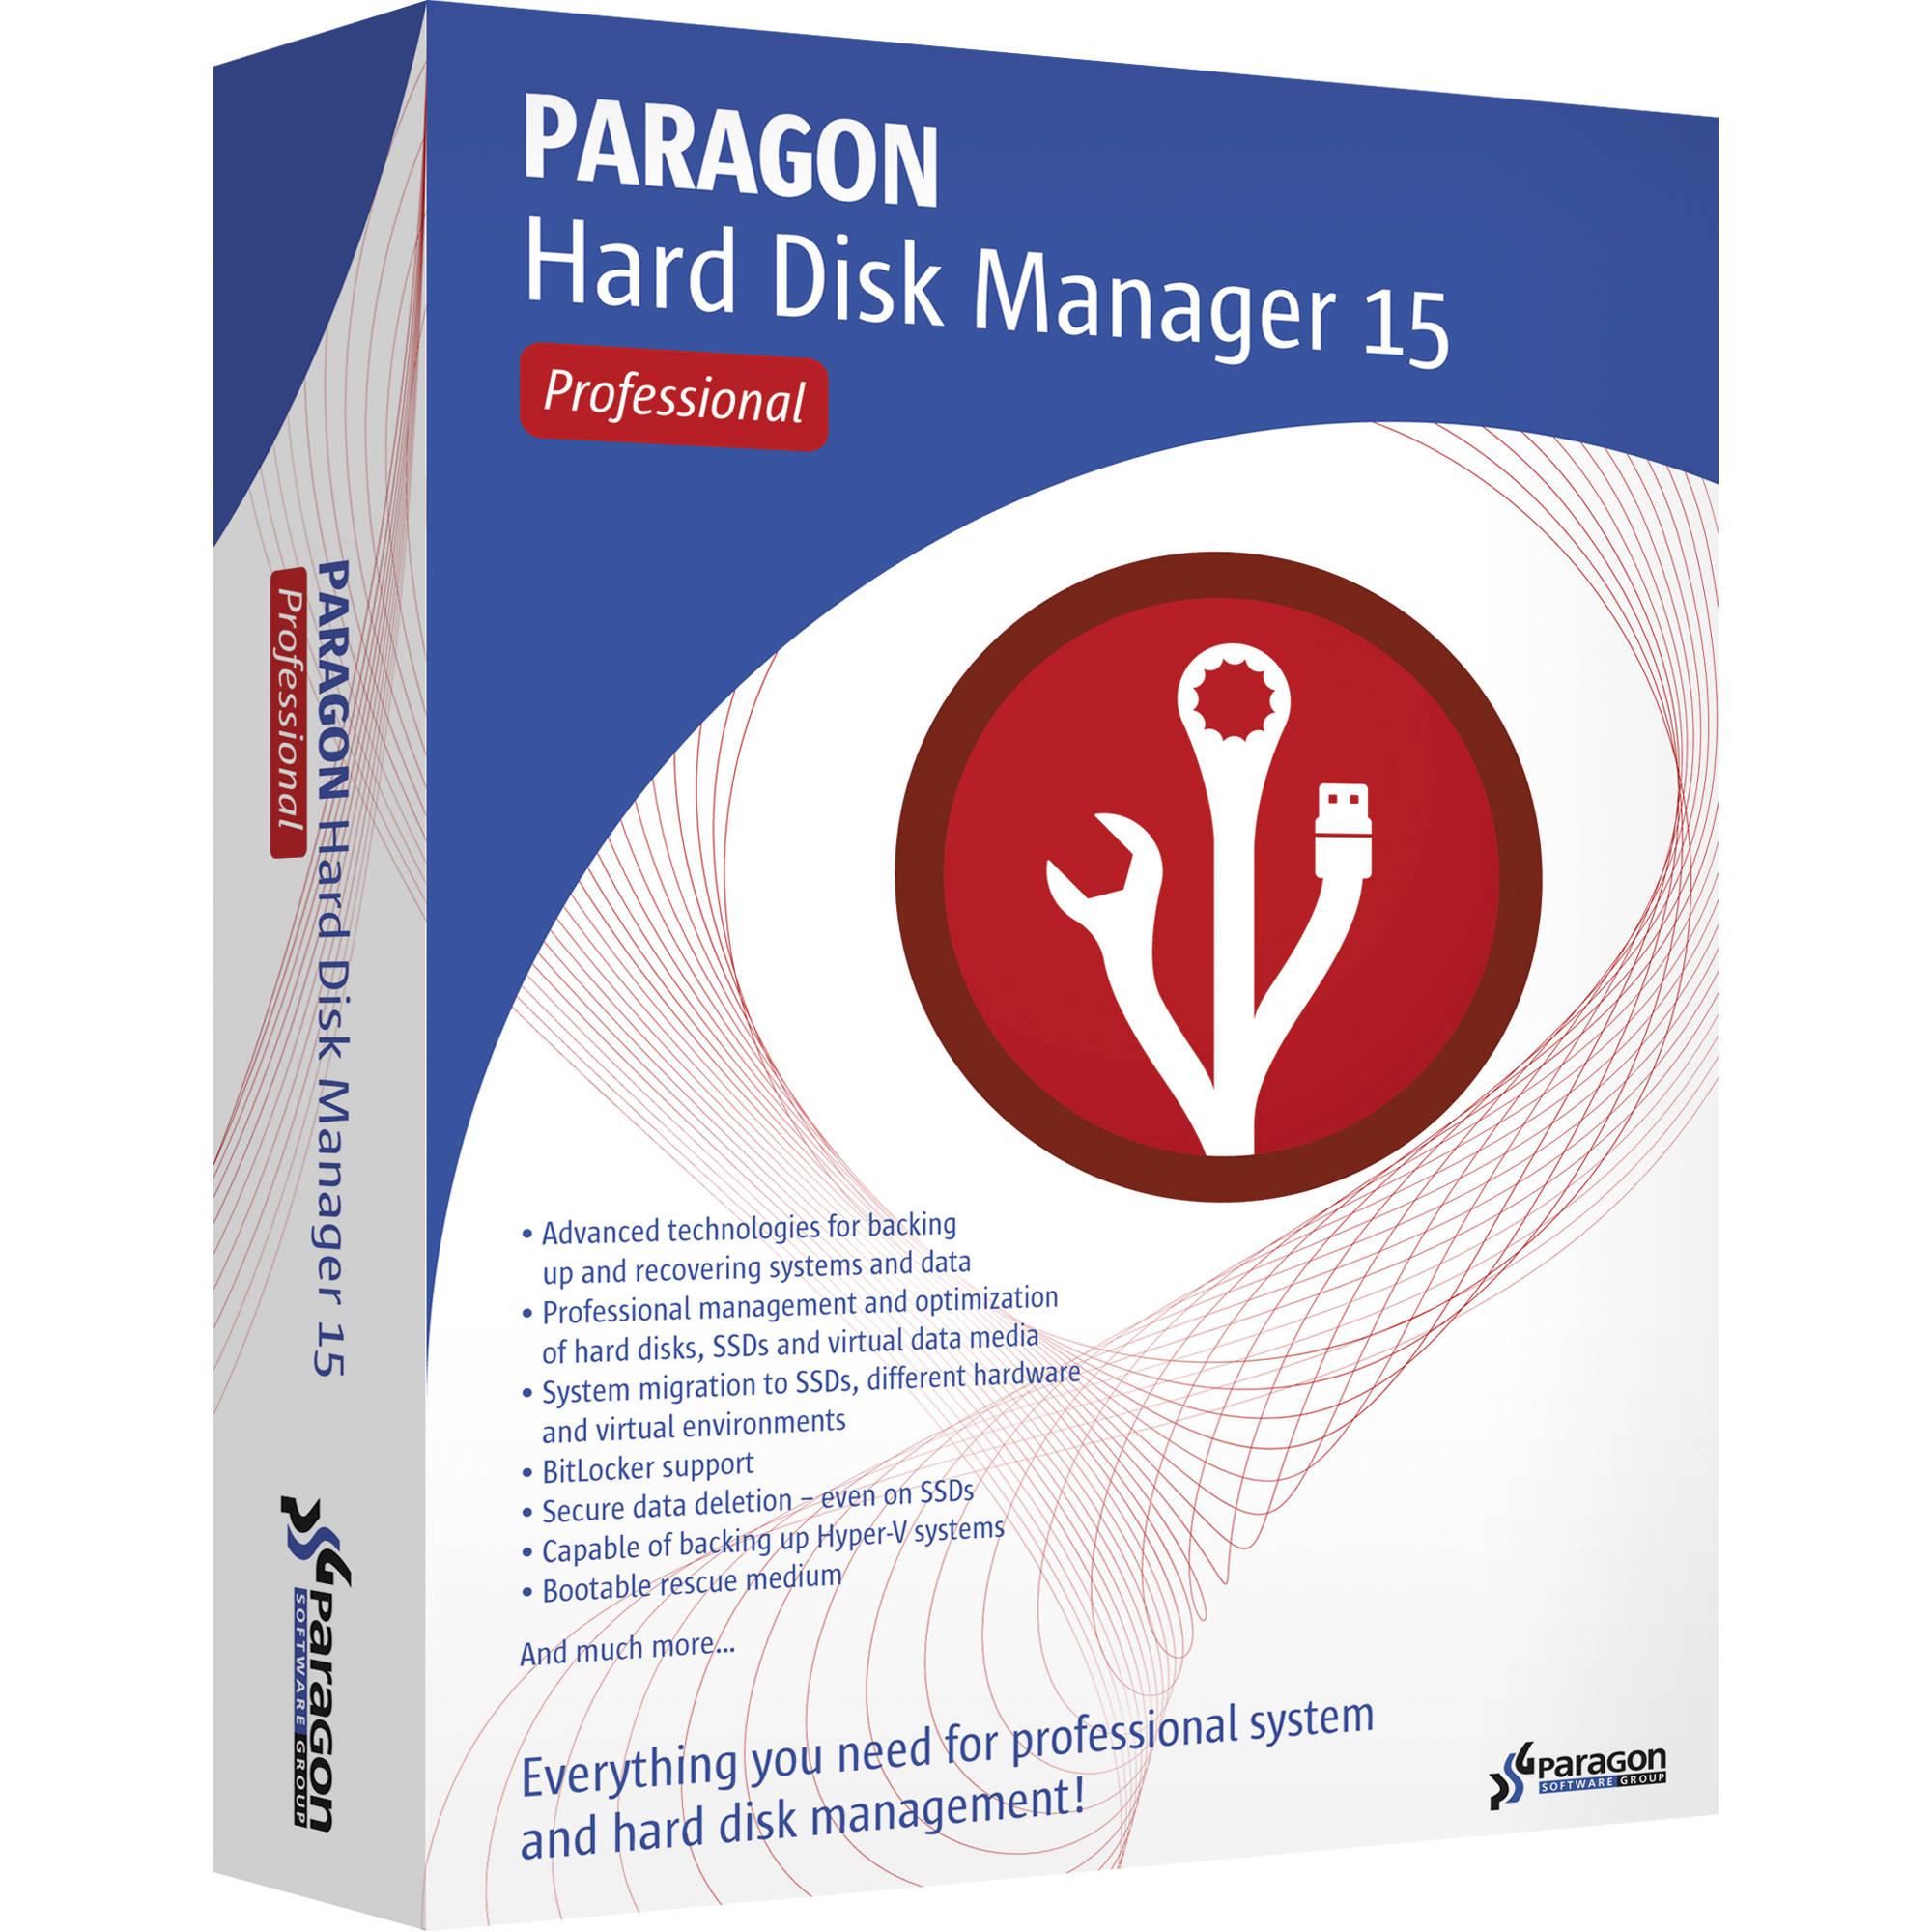 Paragon hard disk manager 15 professional (download) 299prepl.